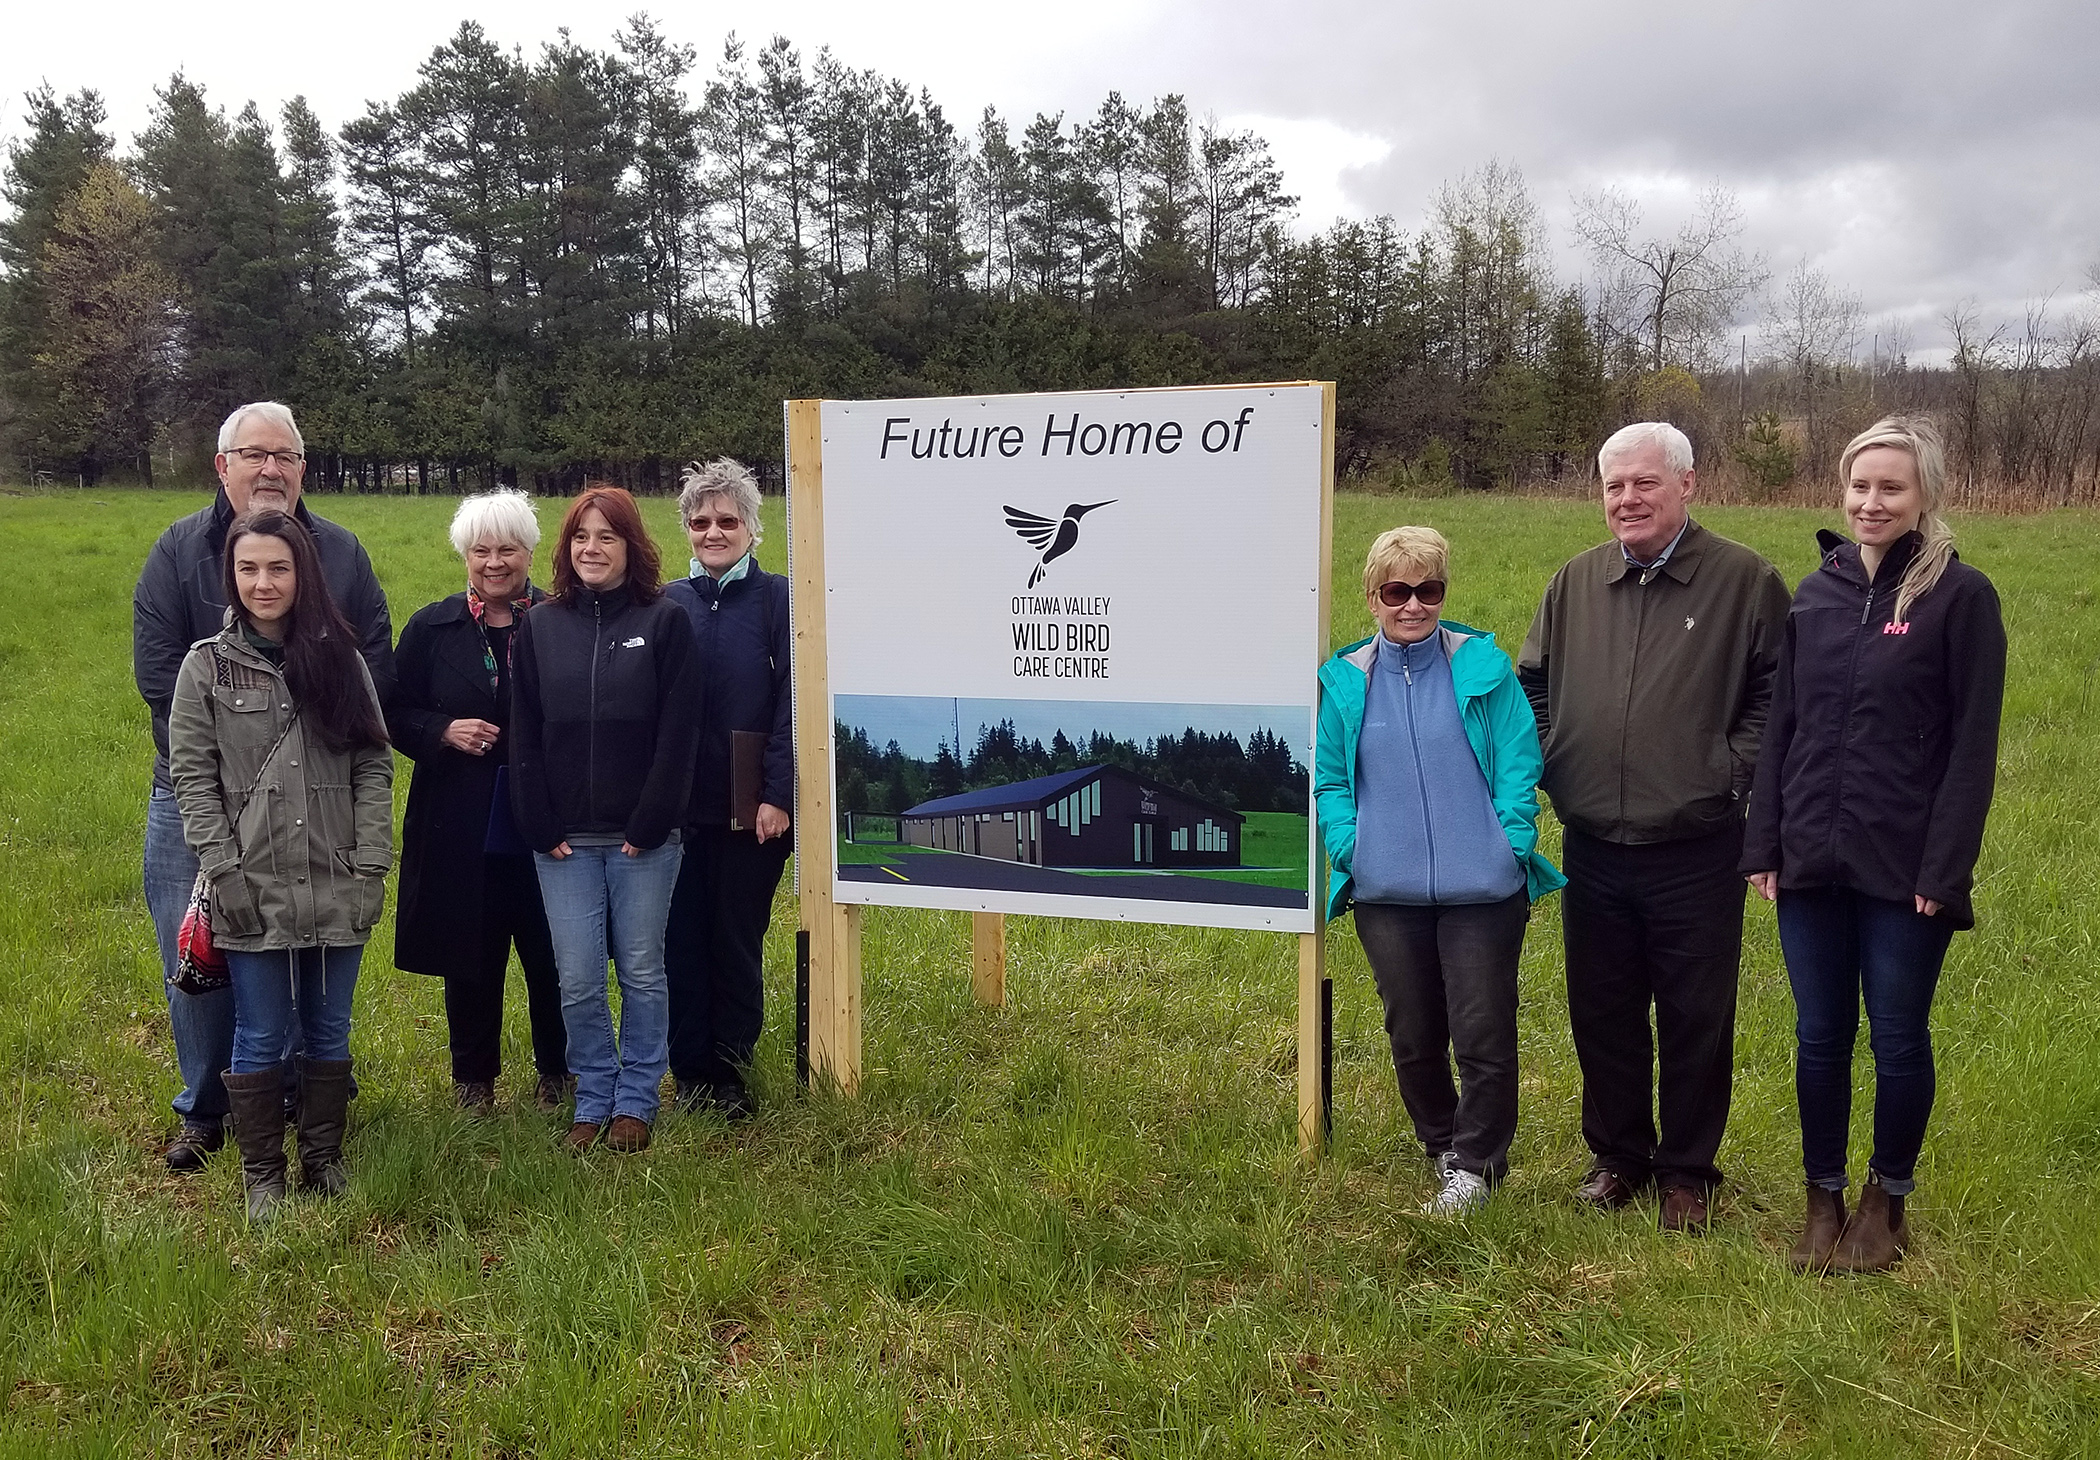 Wild bird care centre moving to West Carleton – West Carleton Online